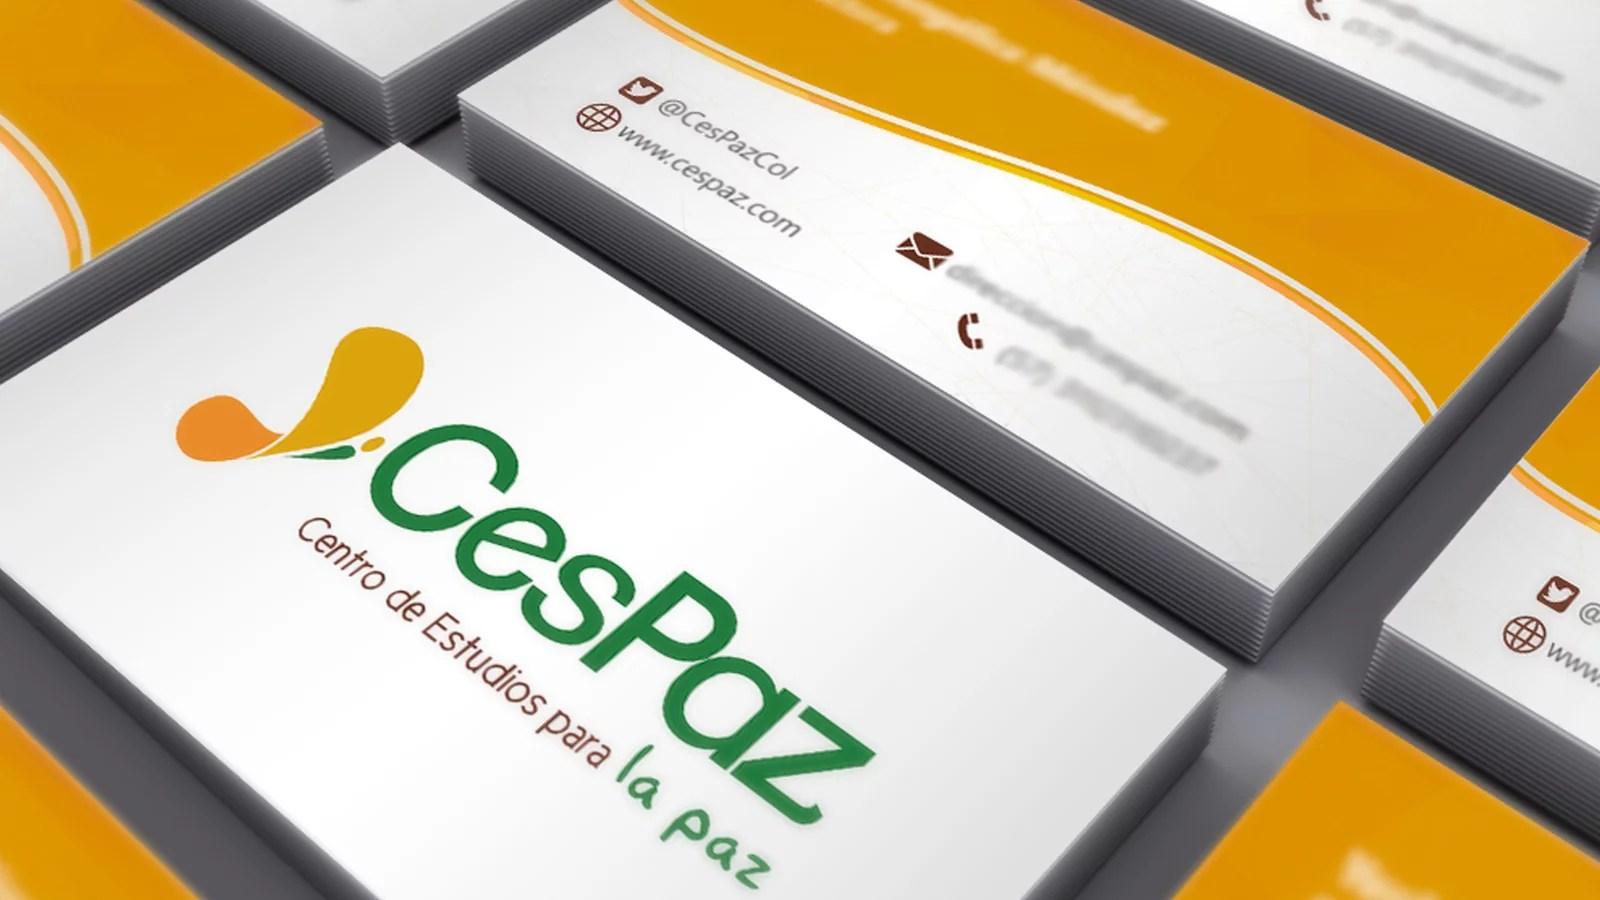 Tarjetas de presentacion CesPaz